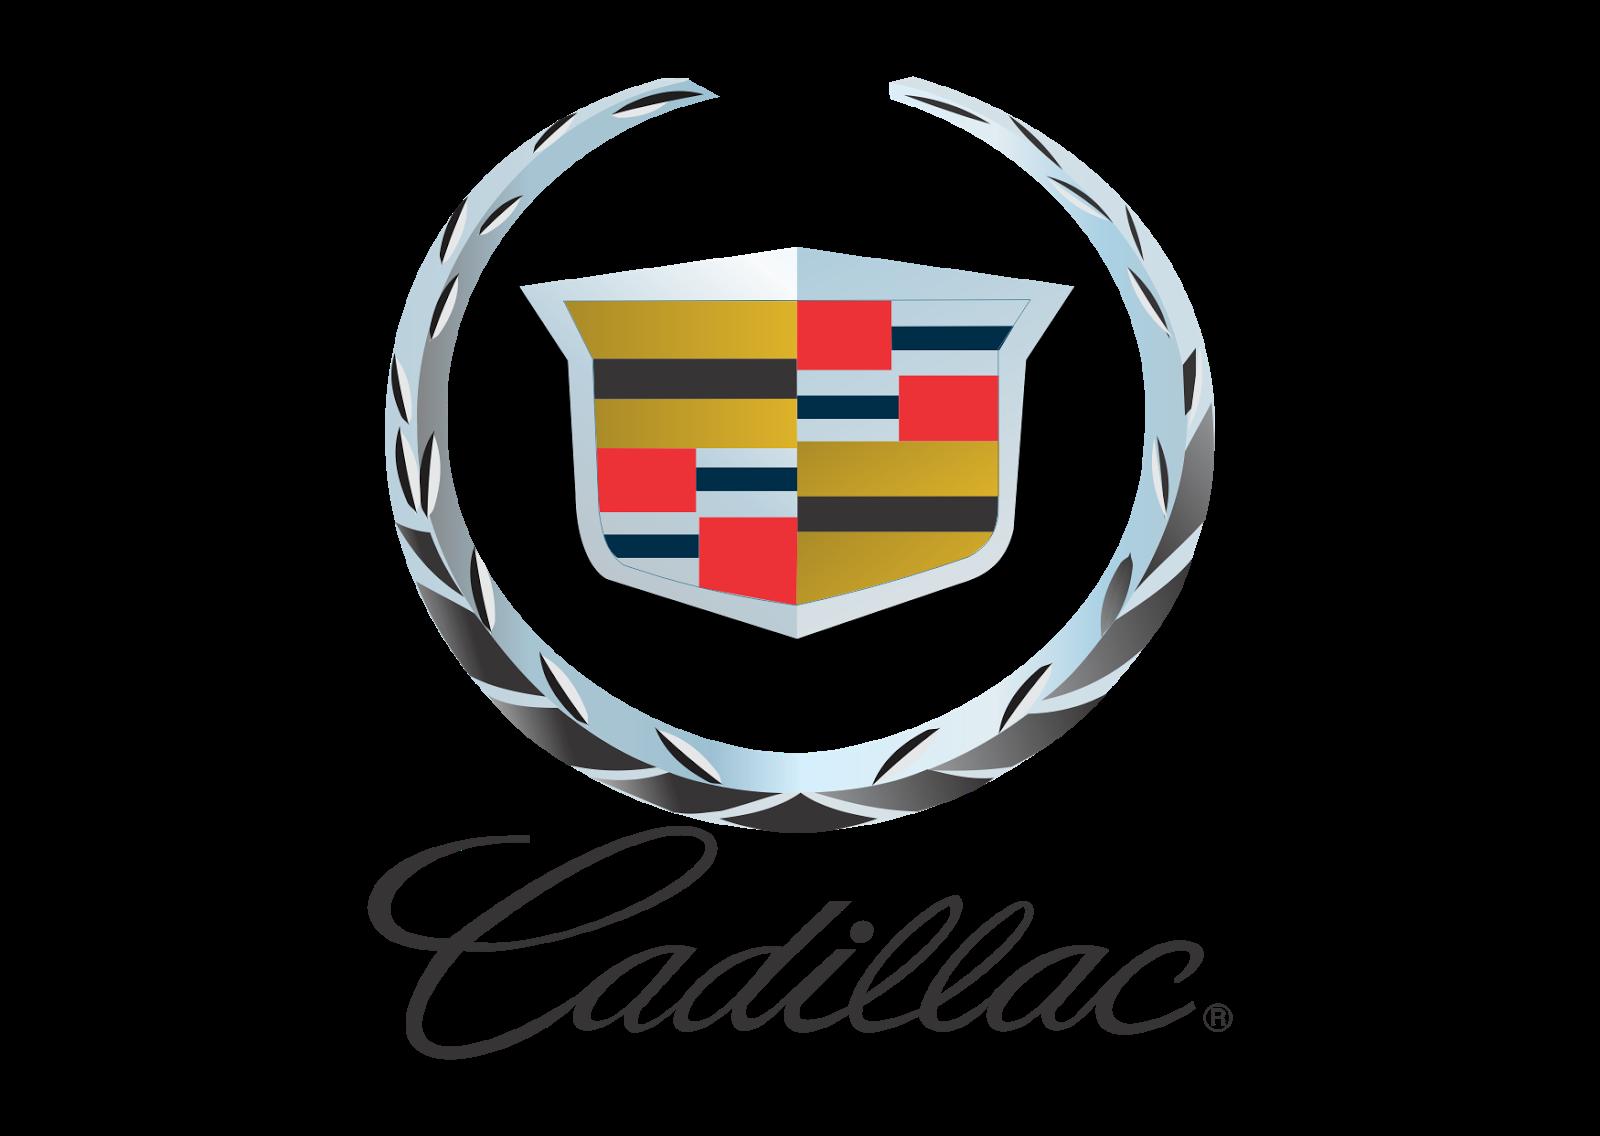 CADILLAC Logo Vector~ Format Cdr, Ai, Eps, Svg, PDF, PNG